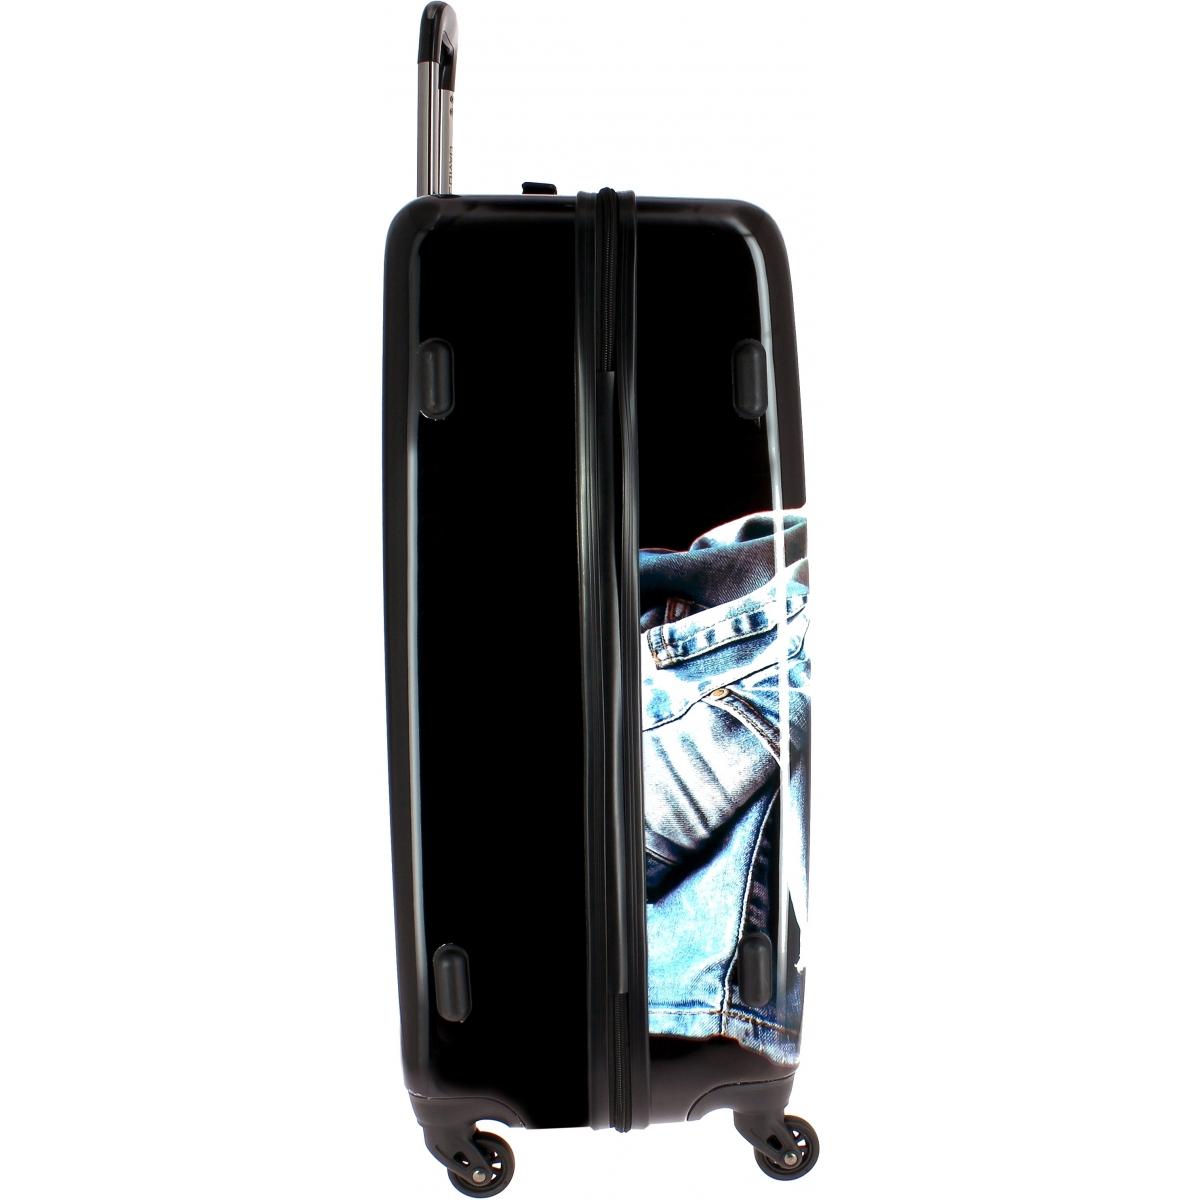 valise rigide david jones taille m 67cm ba20521m couleur principale jean promotion. Black Bedroom Furniture Sets. Home Design Ideas